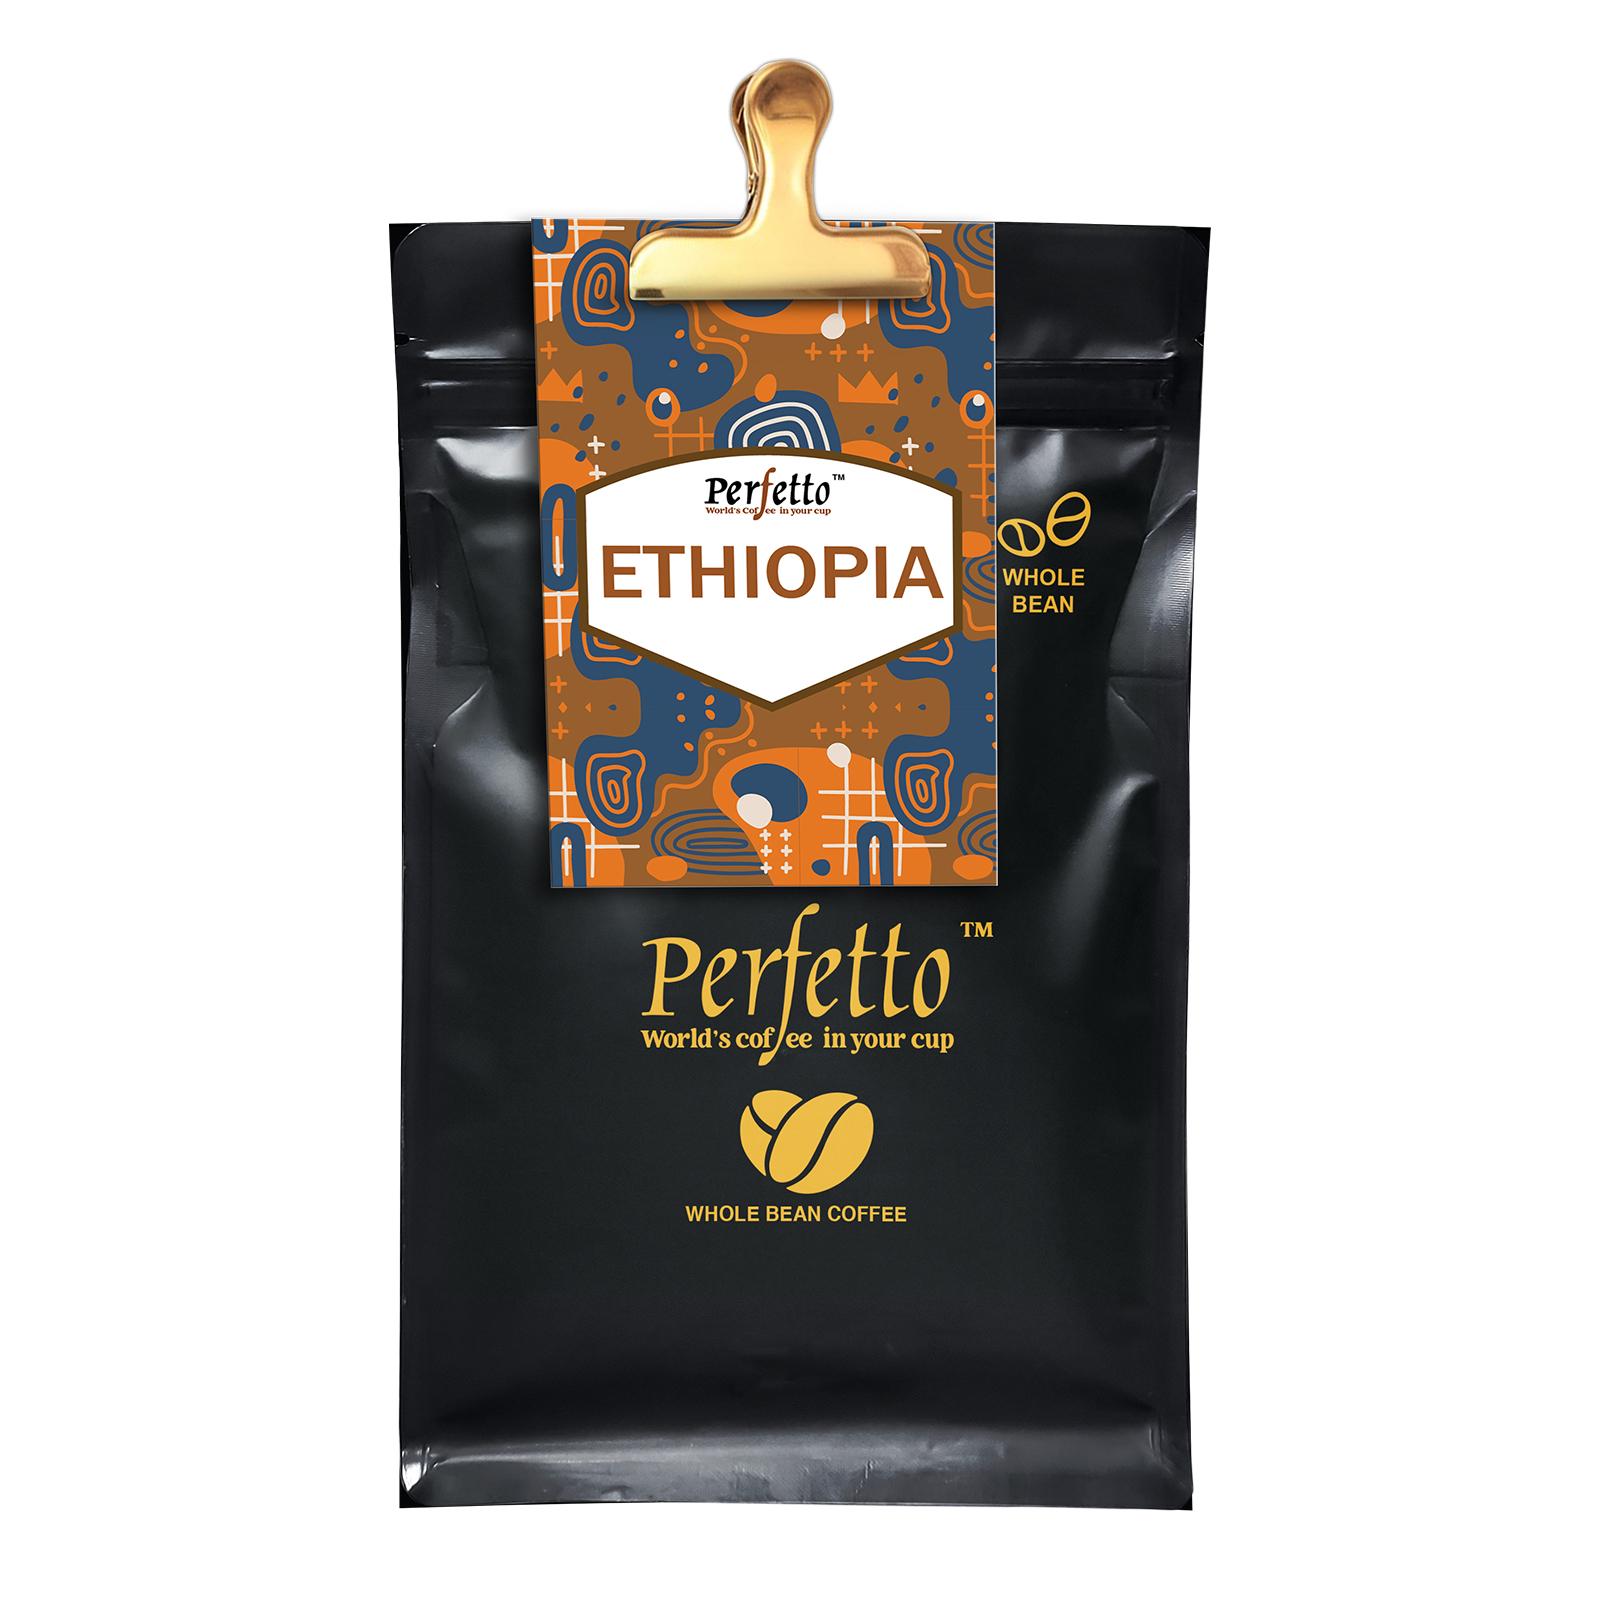 Ethiopia Guji Roasted Coffee Bean